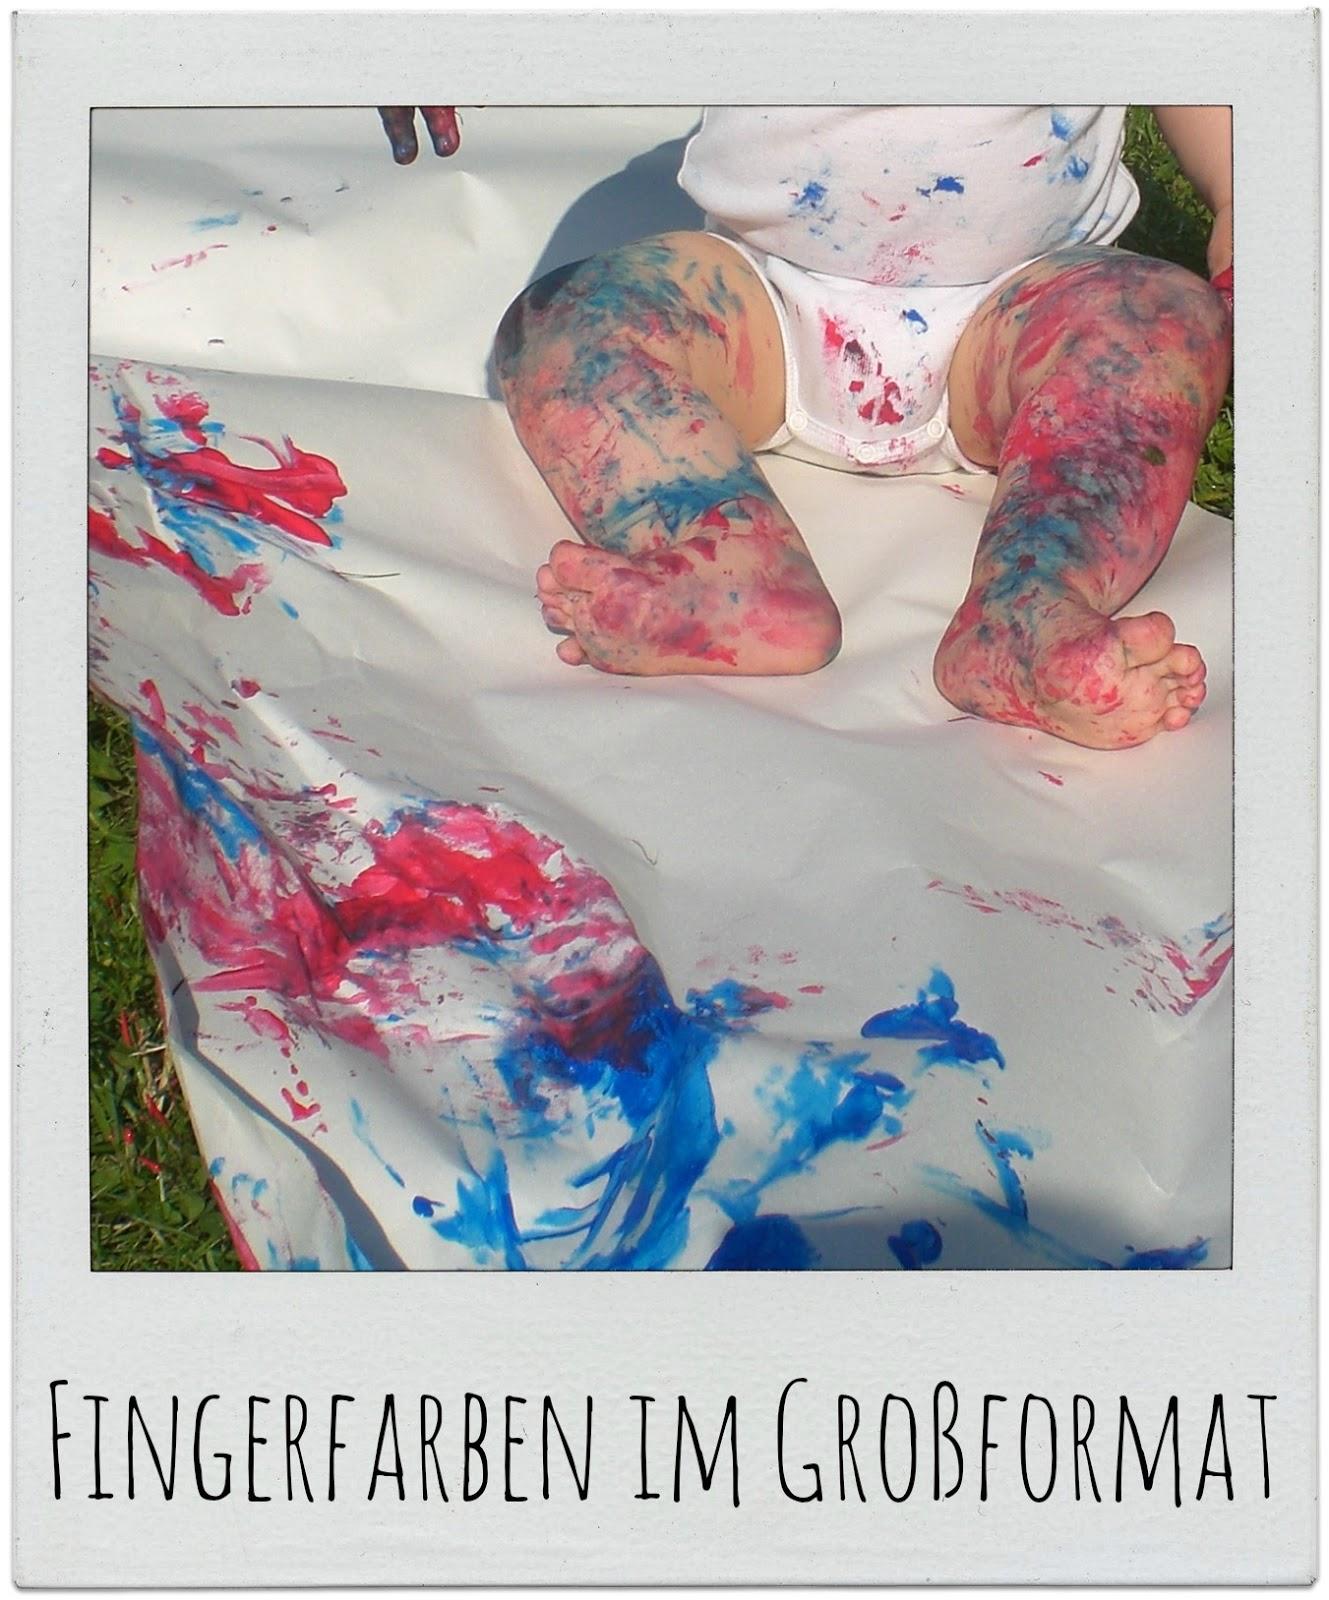 http://gemachtesundgedachtes.blogspot.de/2013/06/malerei-am-und-unterm-himmel.html